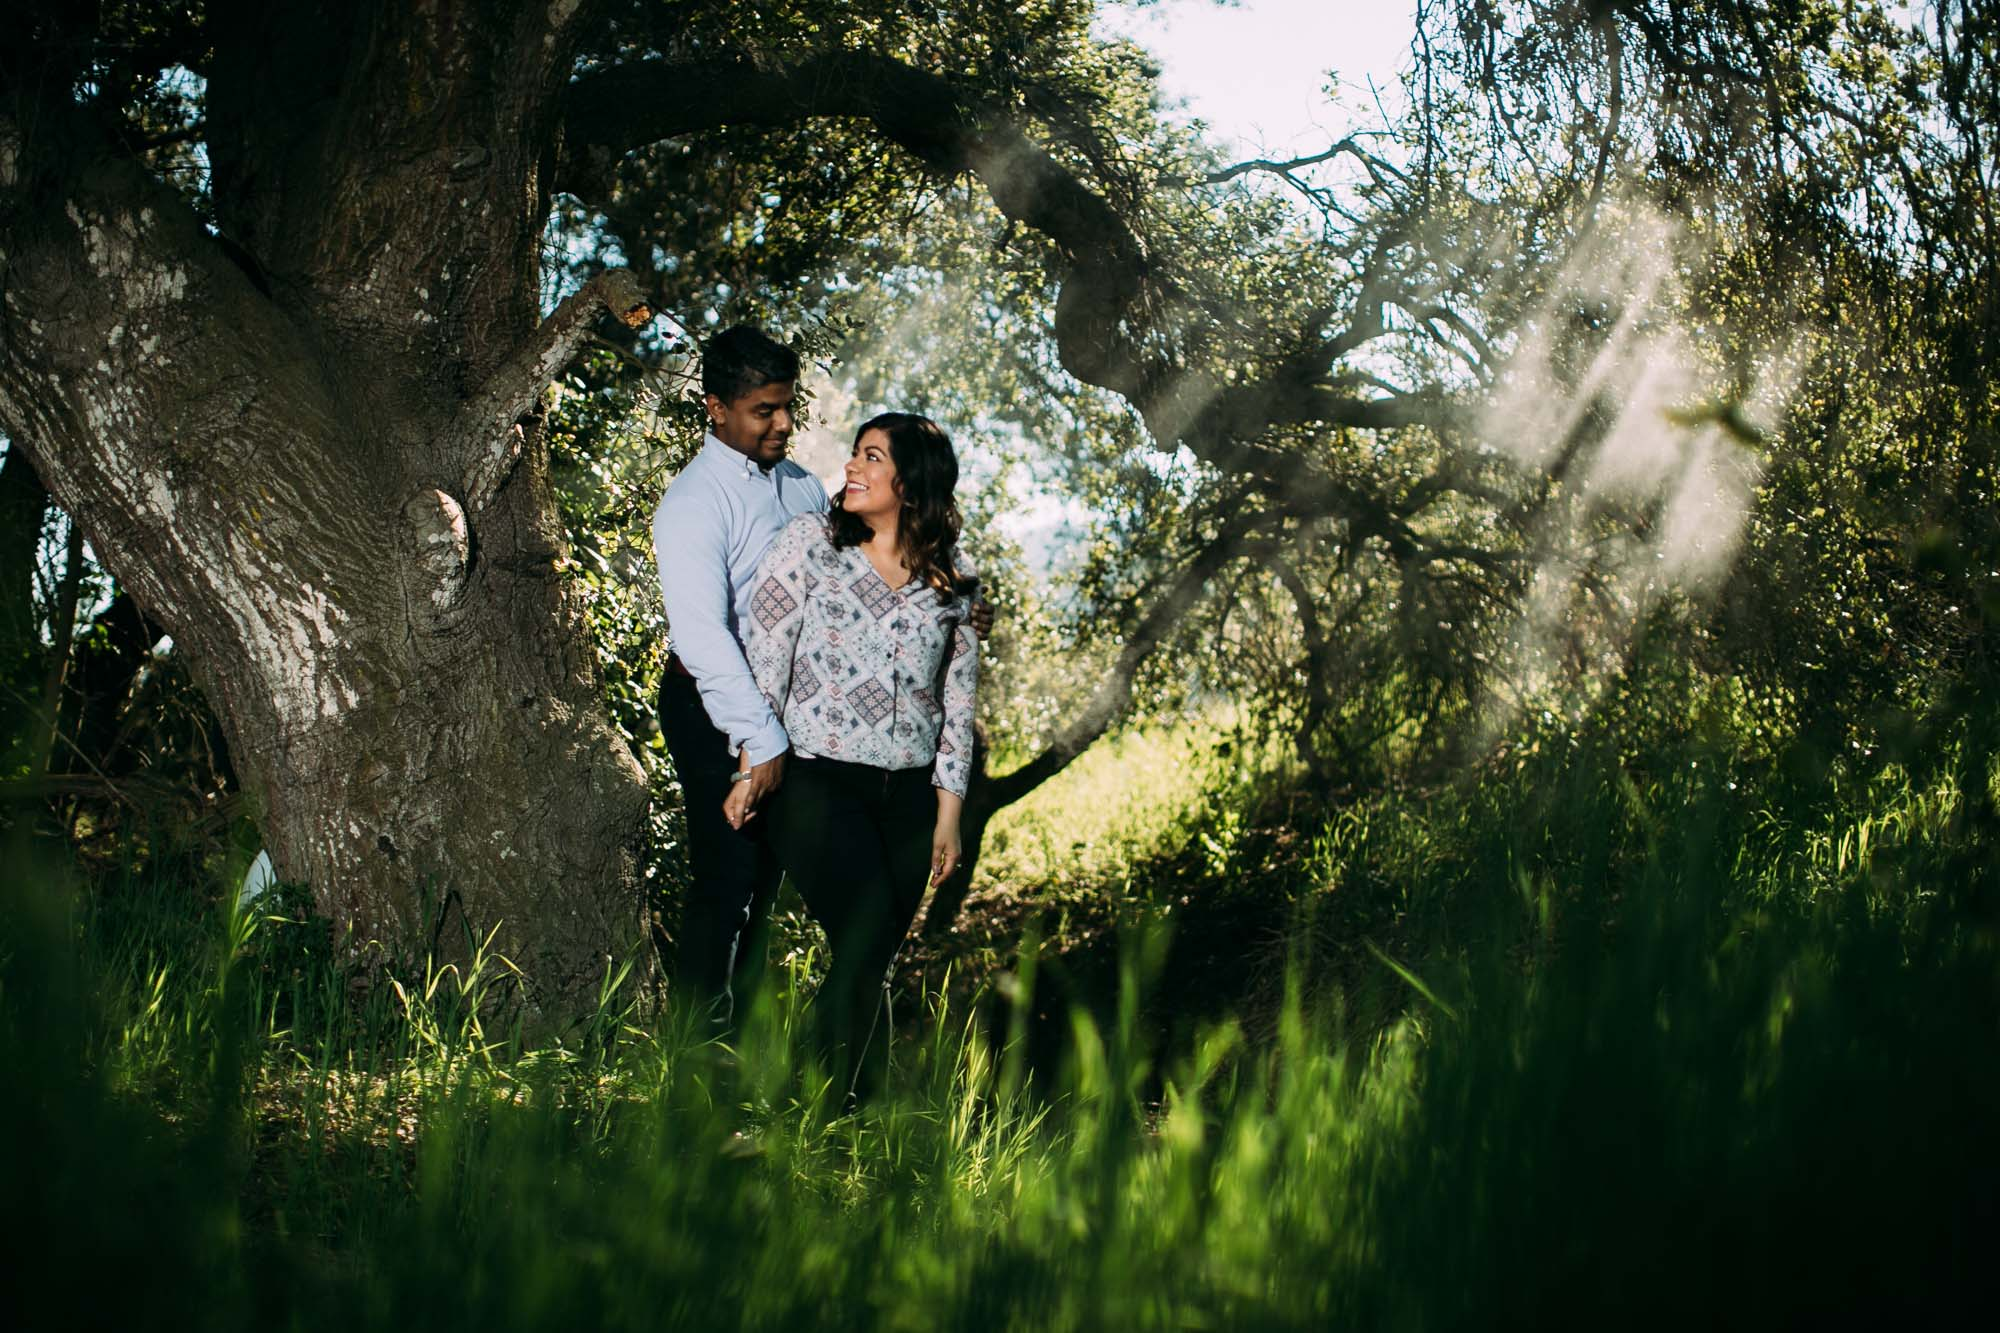 DS-Orange-County-Engagement-Photography-Sarah-Mack-Photo -0010-2.jpg